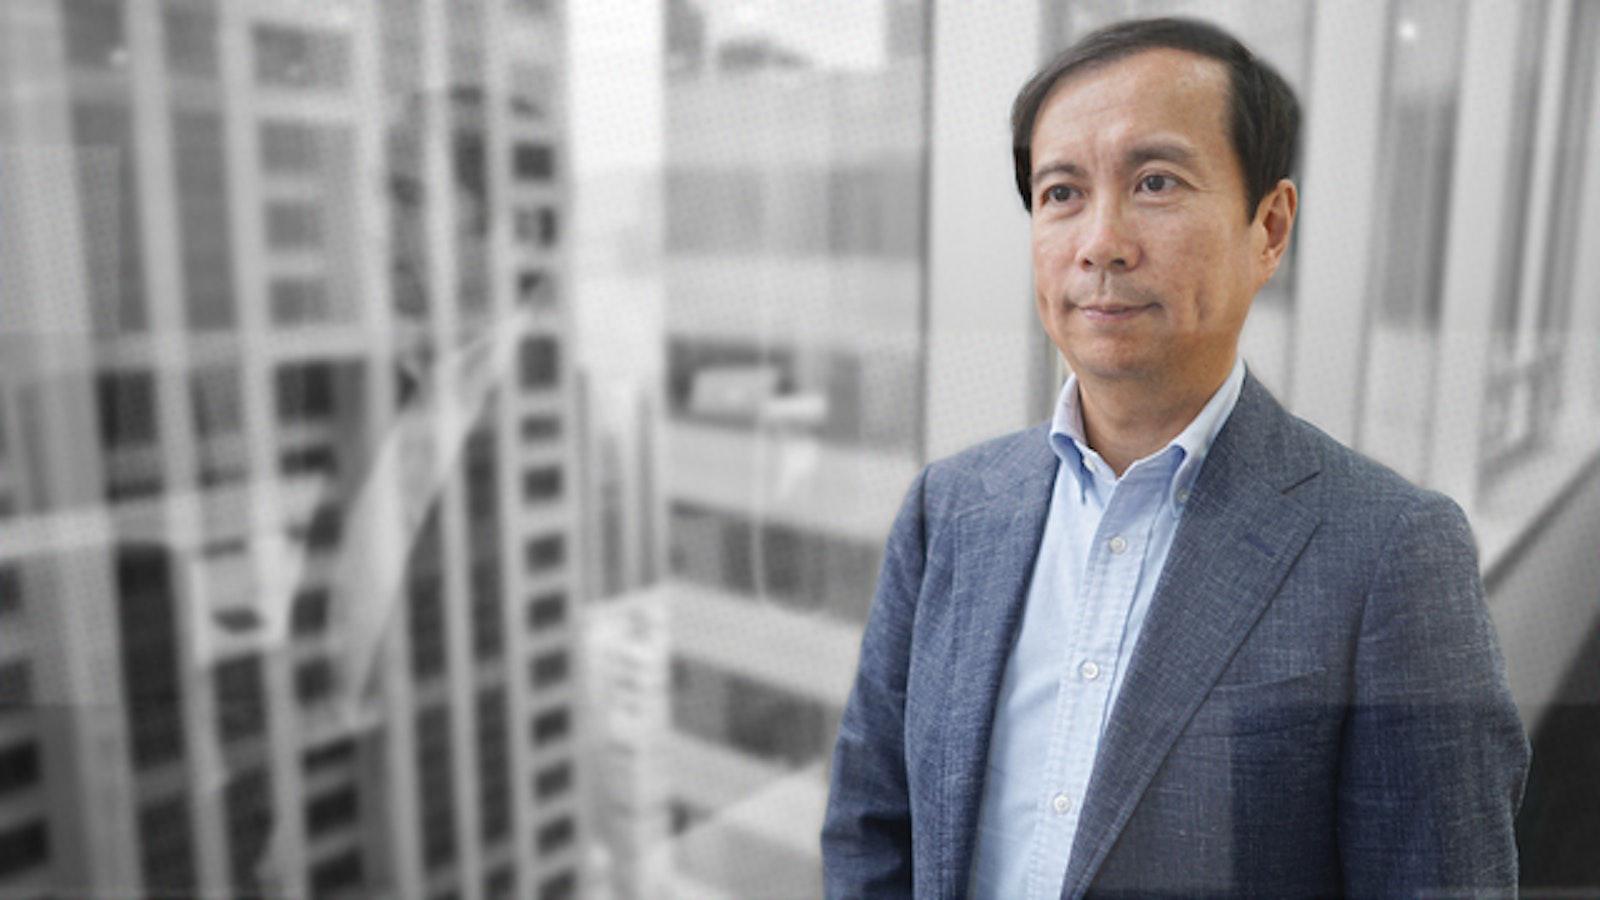 Alibaba CEO Daniel Zhang. Photo by Juro Osawa